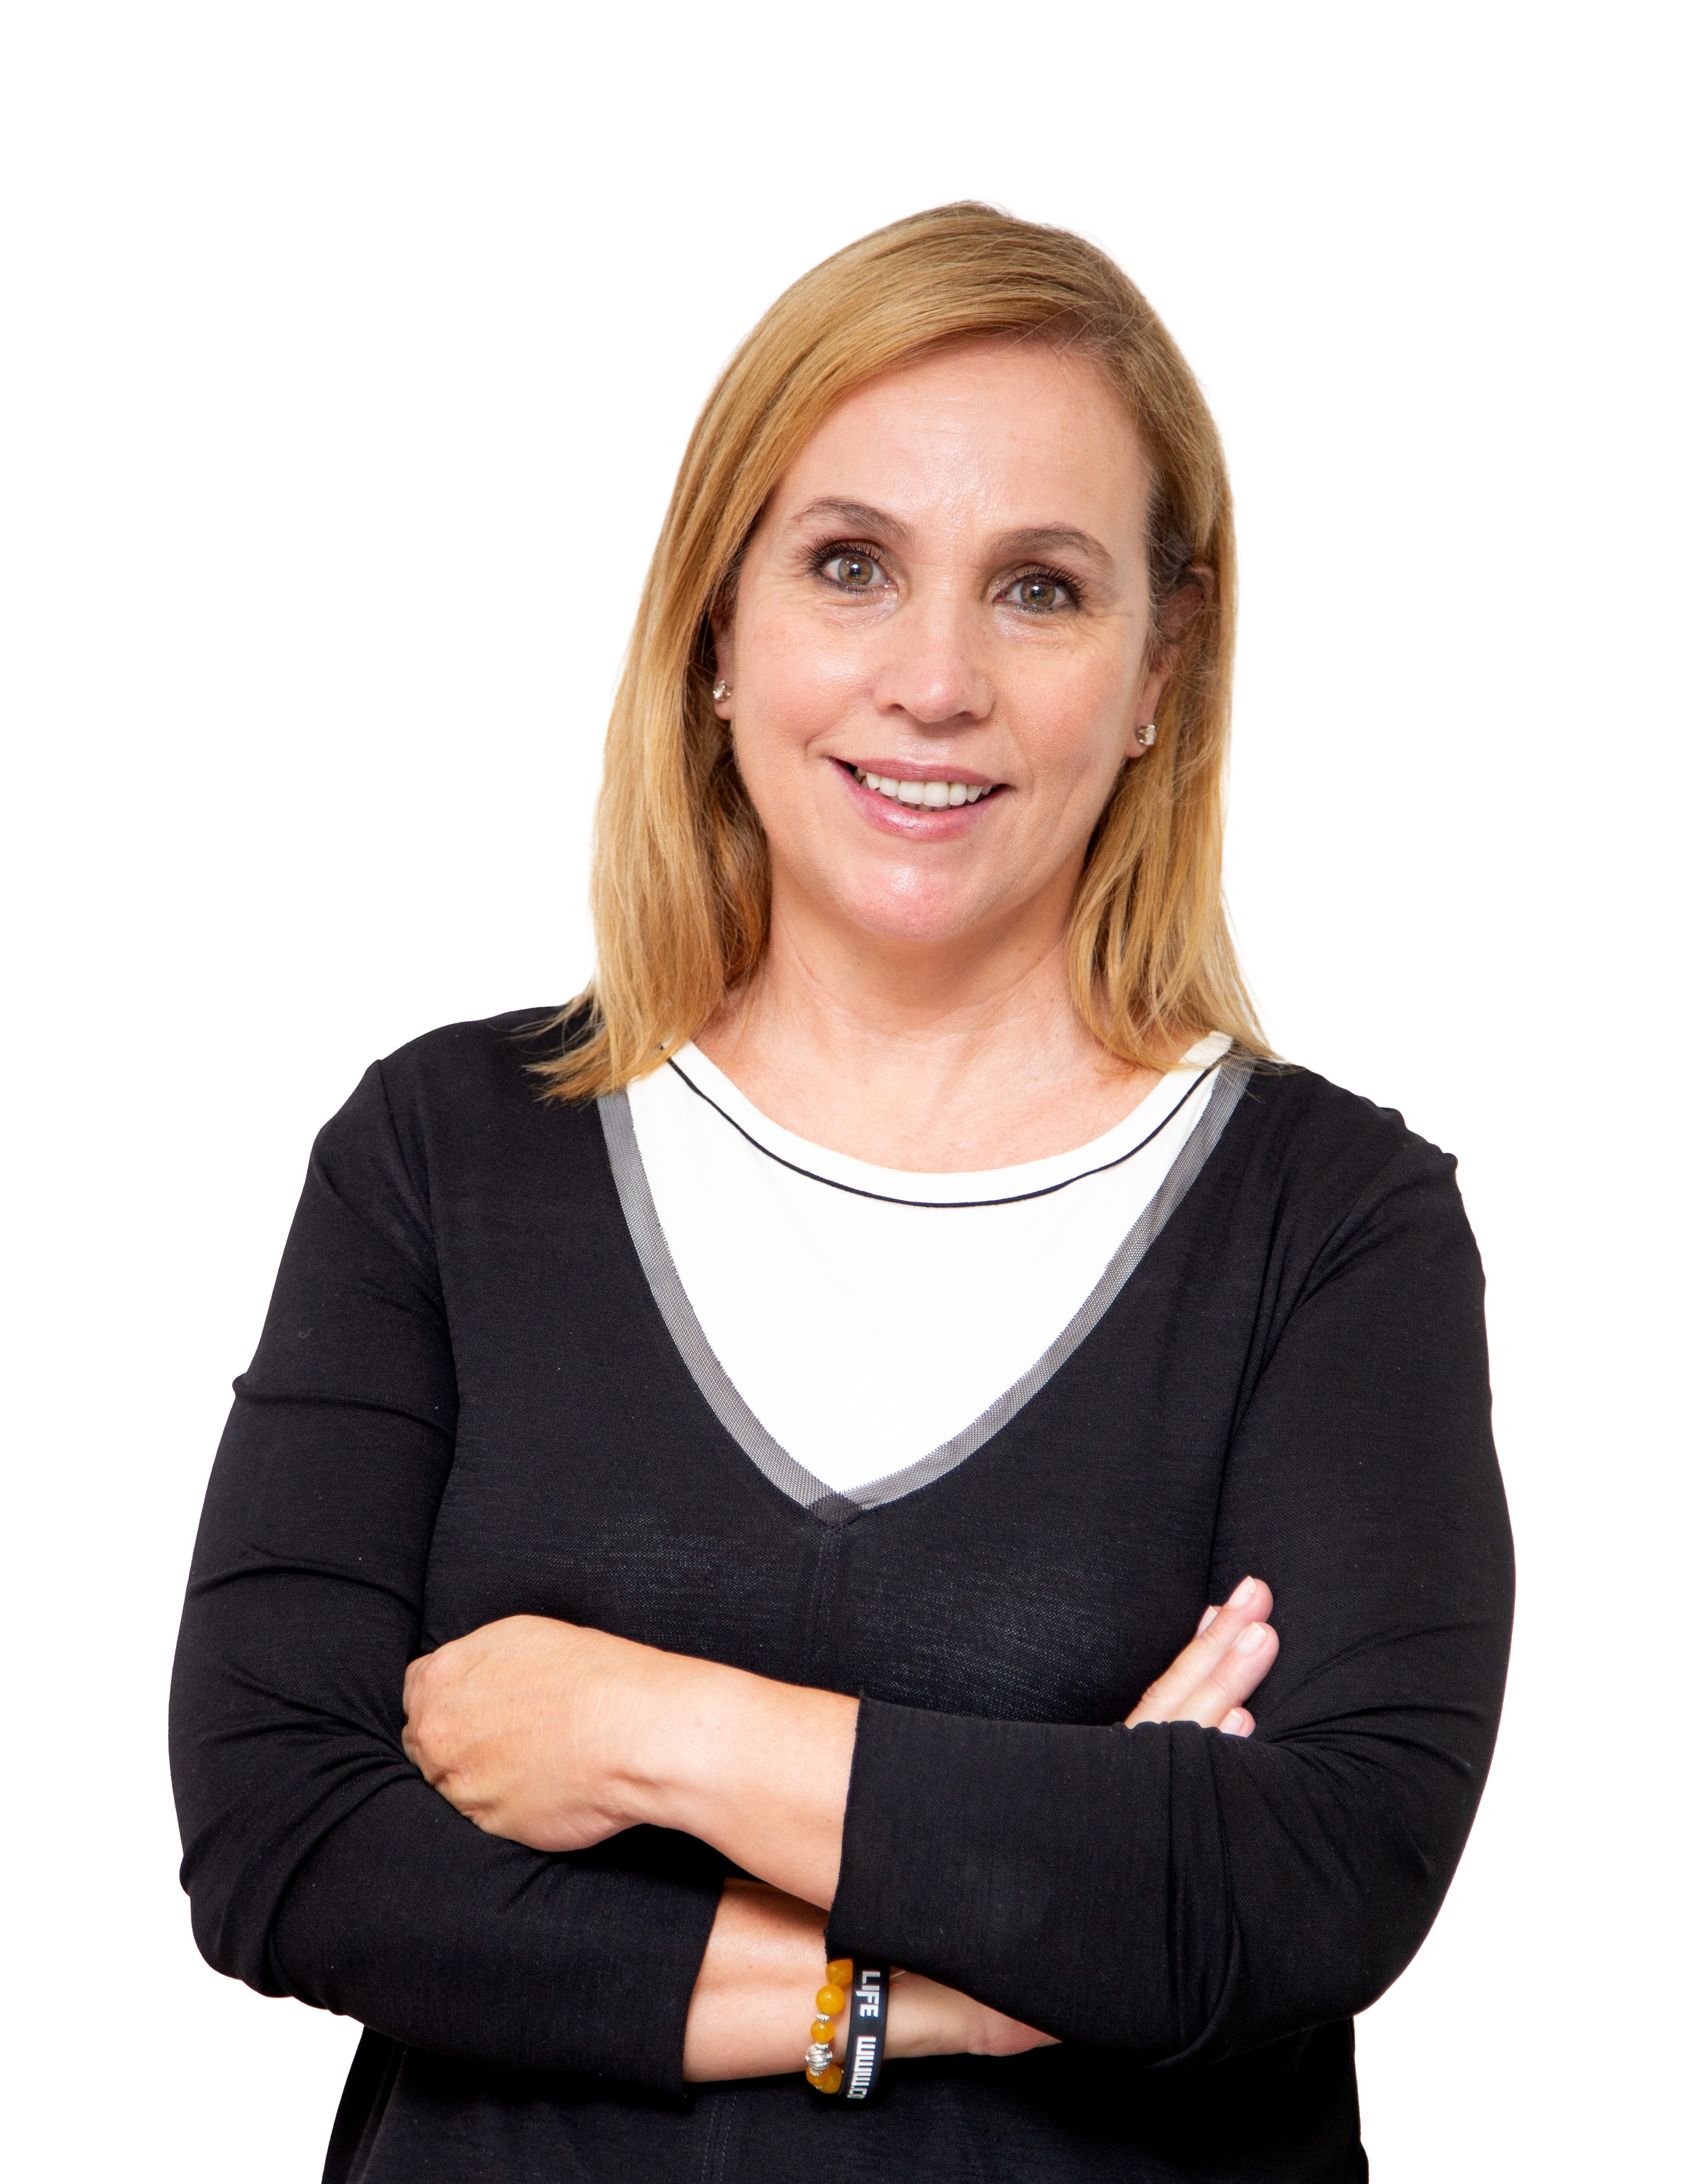 Margarita Gomez-Acebo